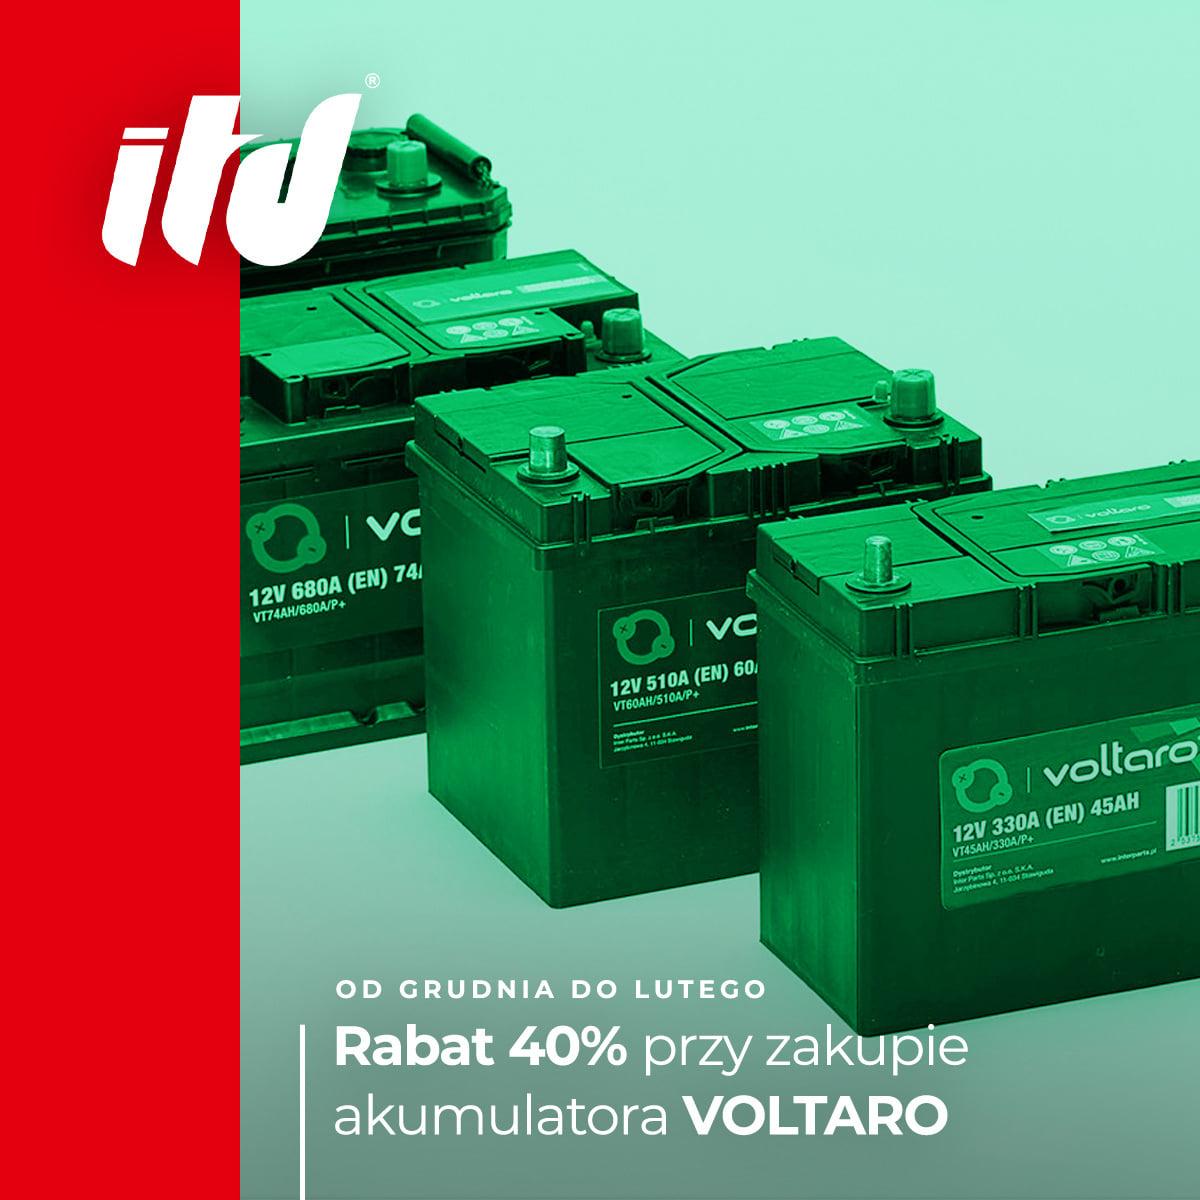 Zimowa Promocja Akumulatorów VOLTARO !